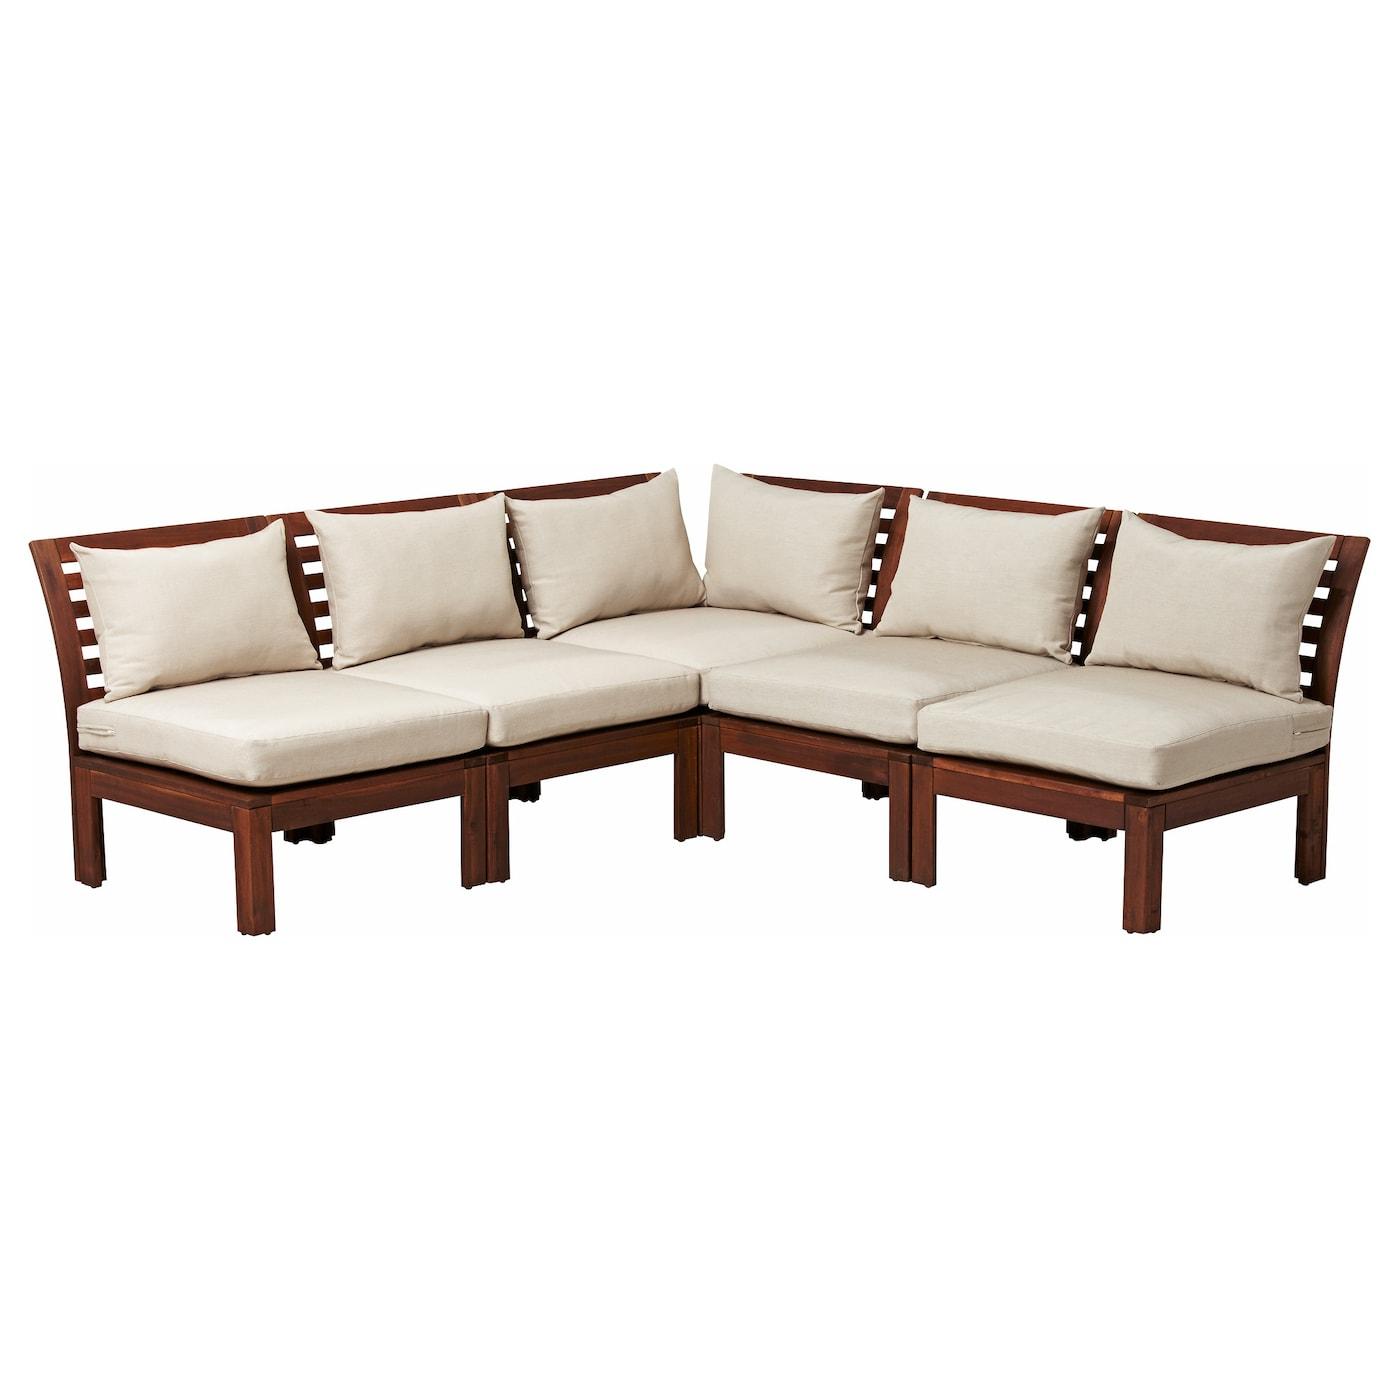 äpplarö corner sofa 3 2 outdoor brown stained hållö beige 206